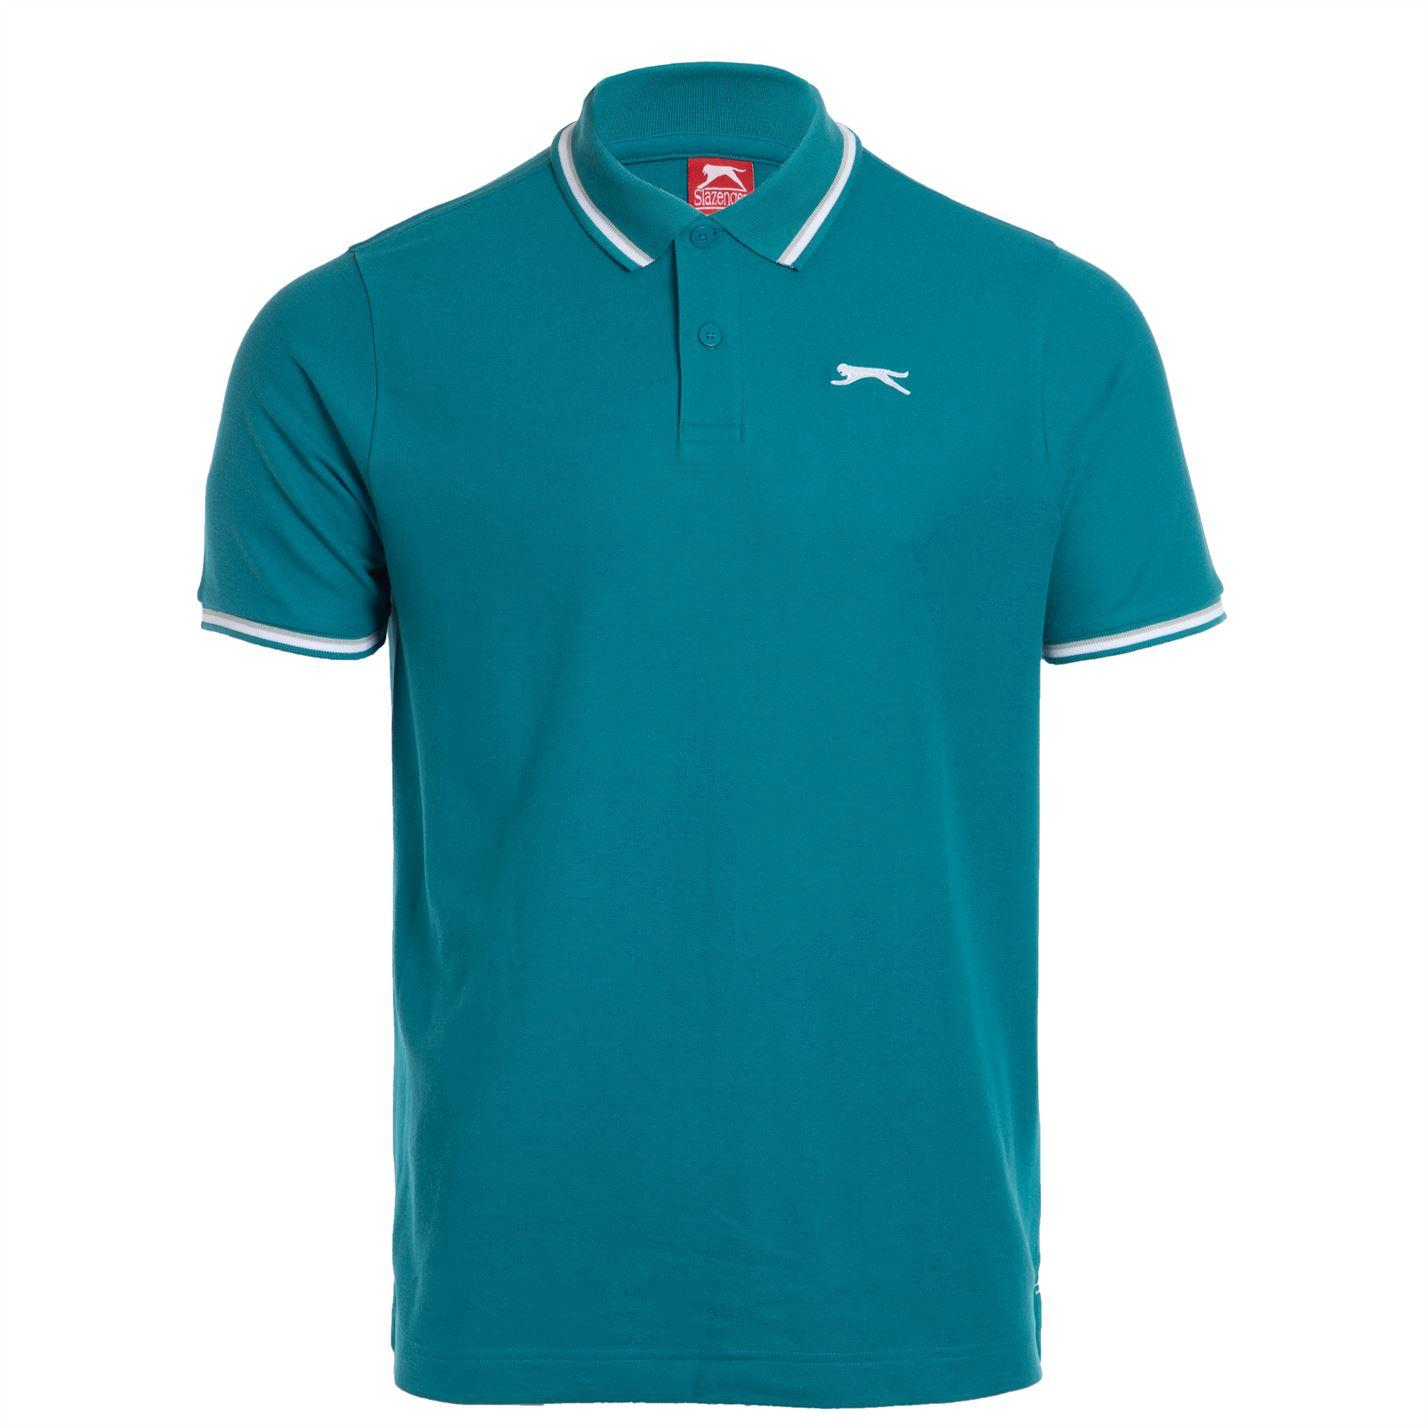 Tricouri Polo Slazenger Tipped pentru Barbati bleu albastru